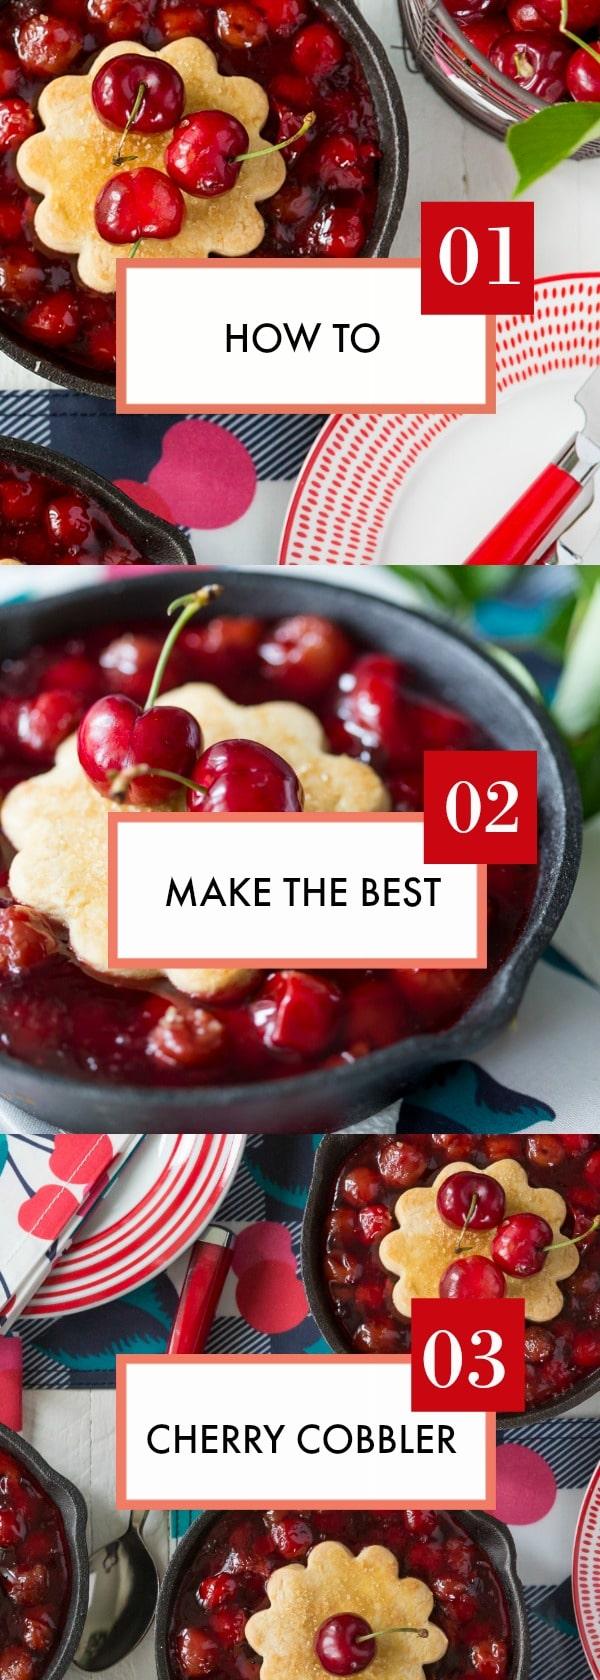 Recipe for the BEST Cherry Cobbler!